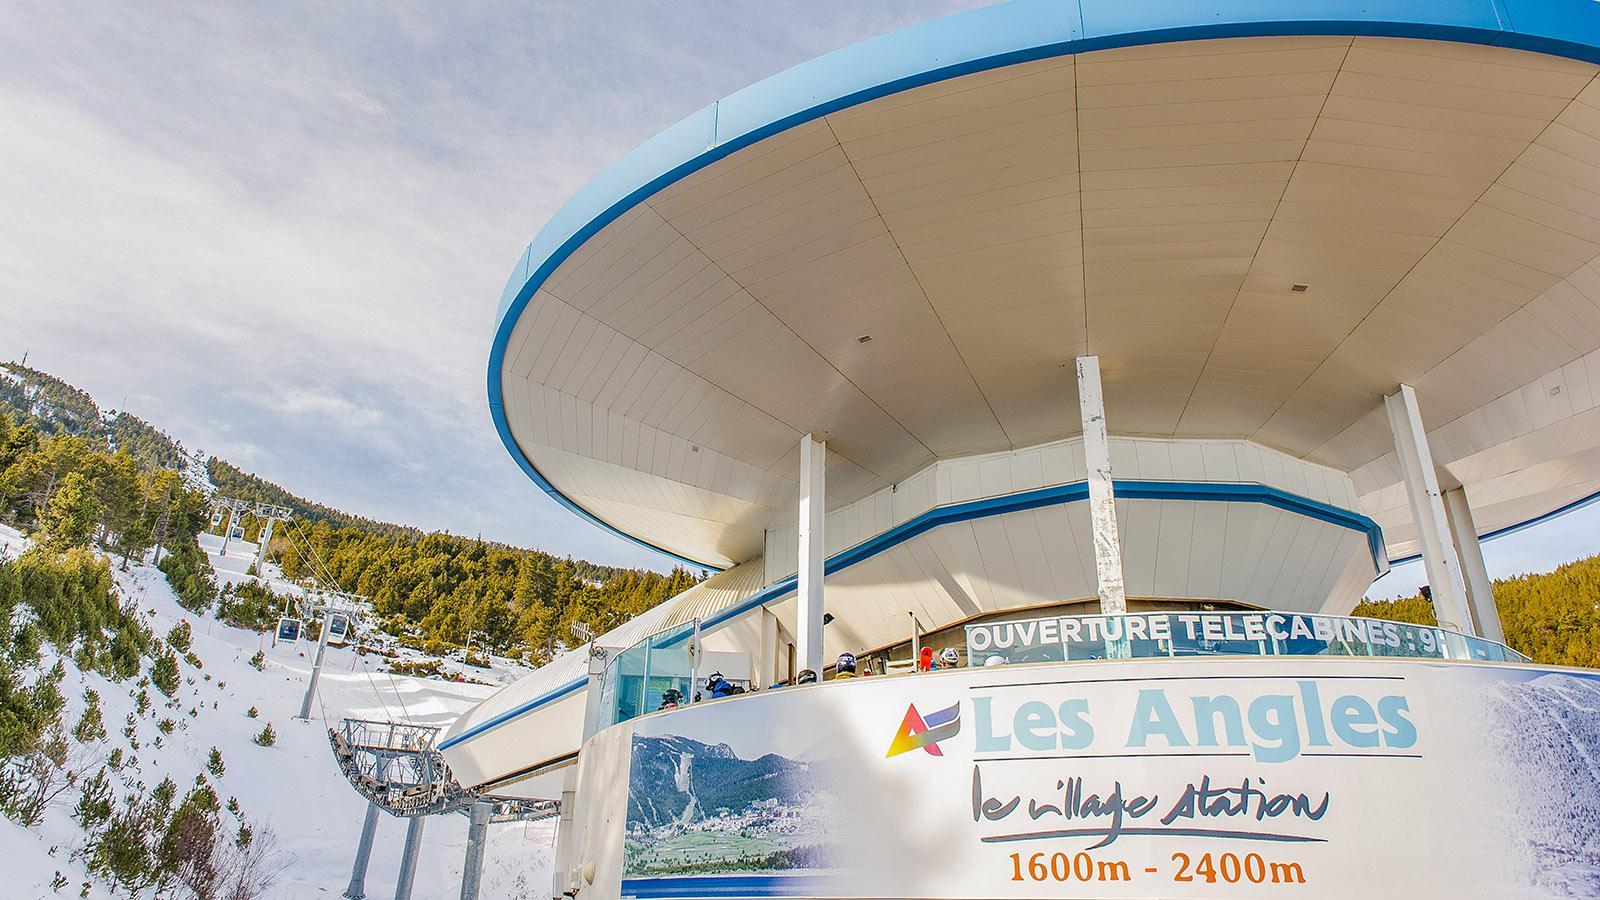 Pyrénées-Orientales: Les Angles, Talstation. Foto: Hilke Maunder